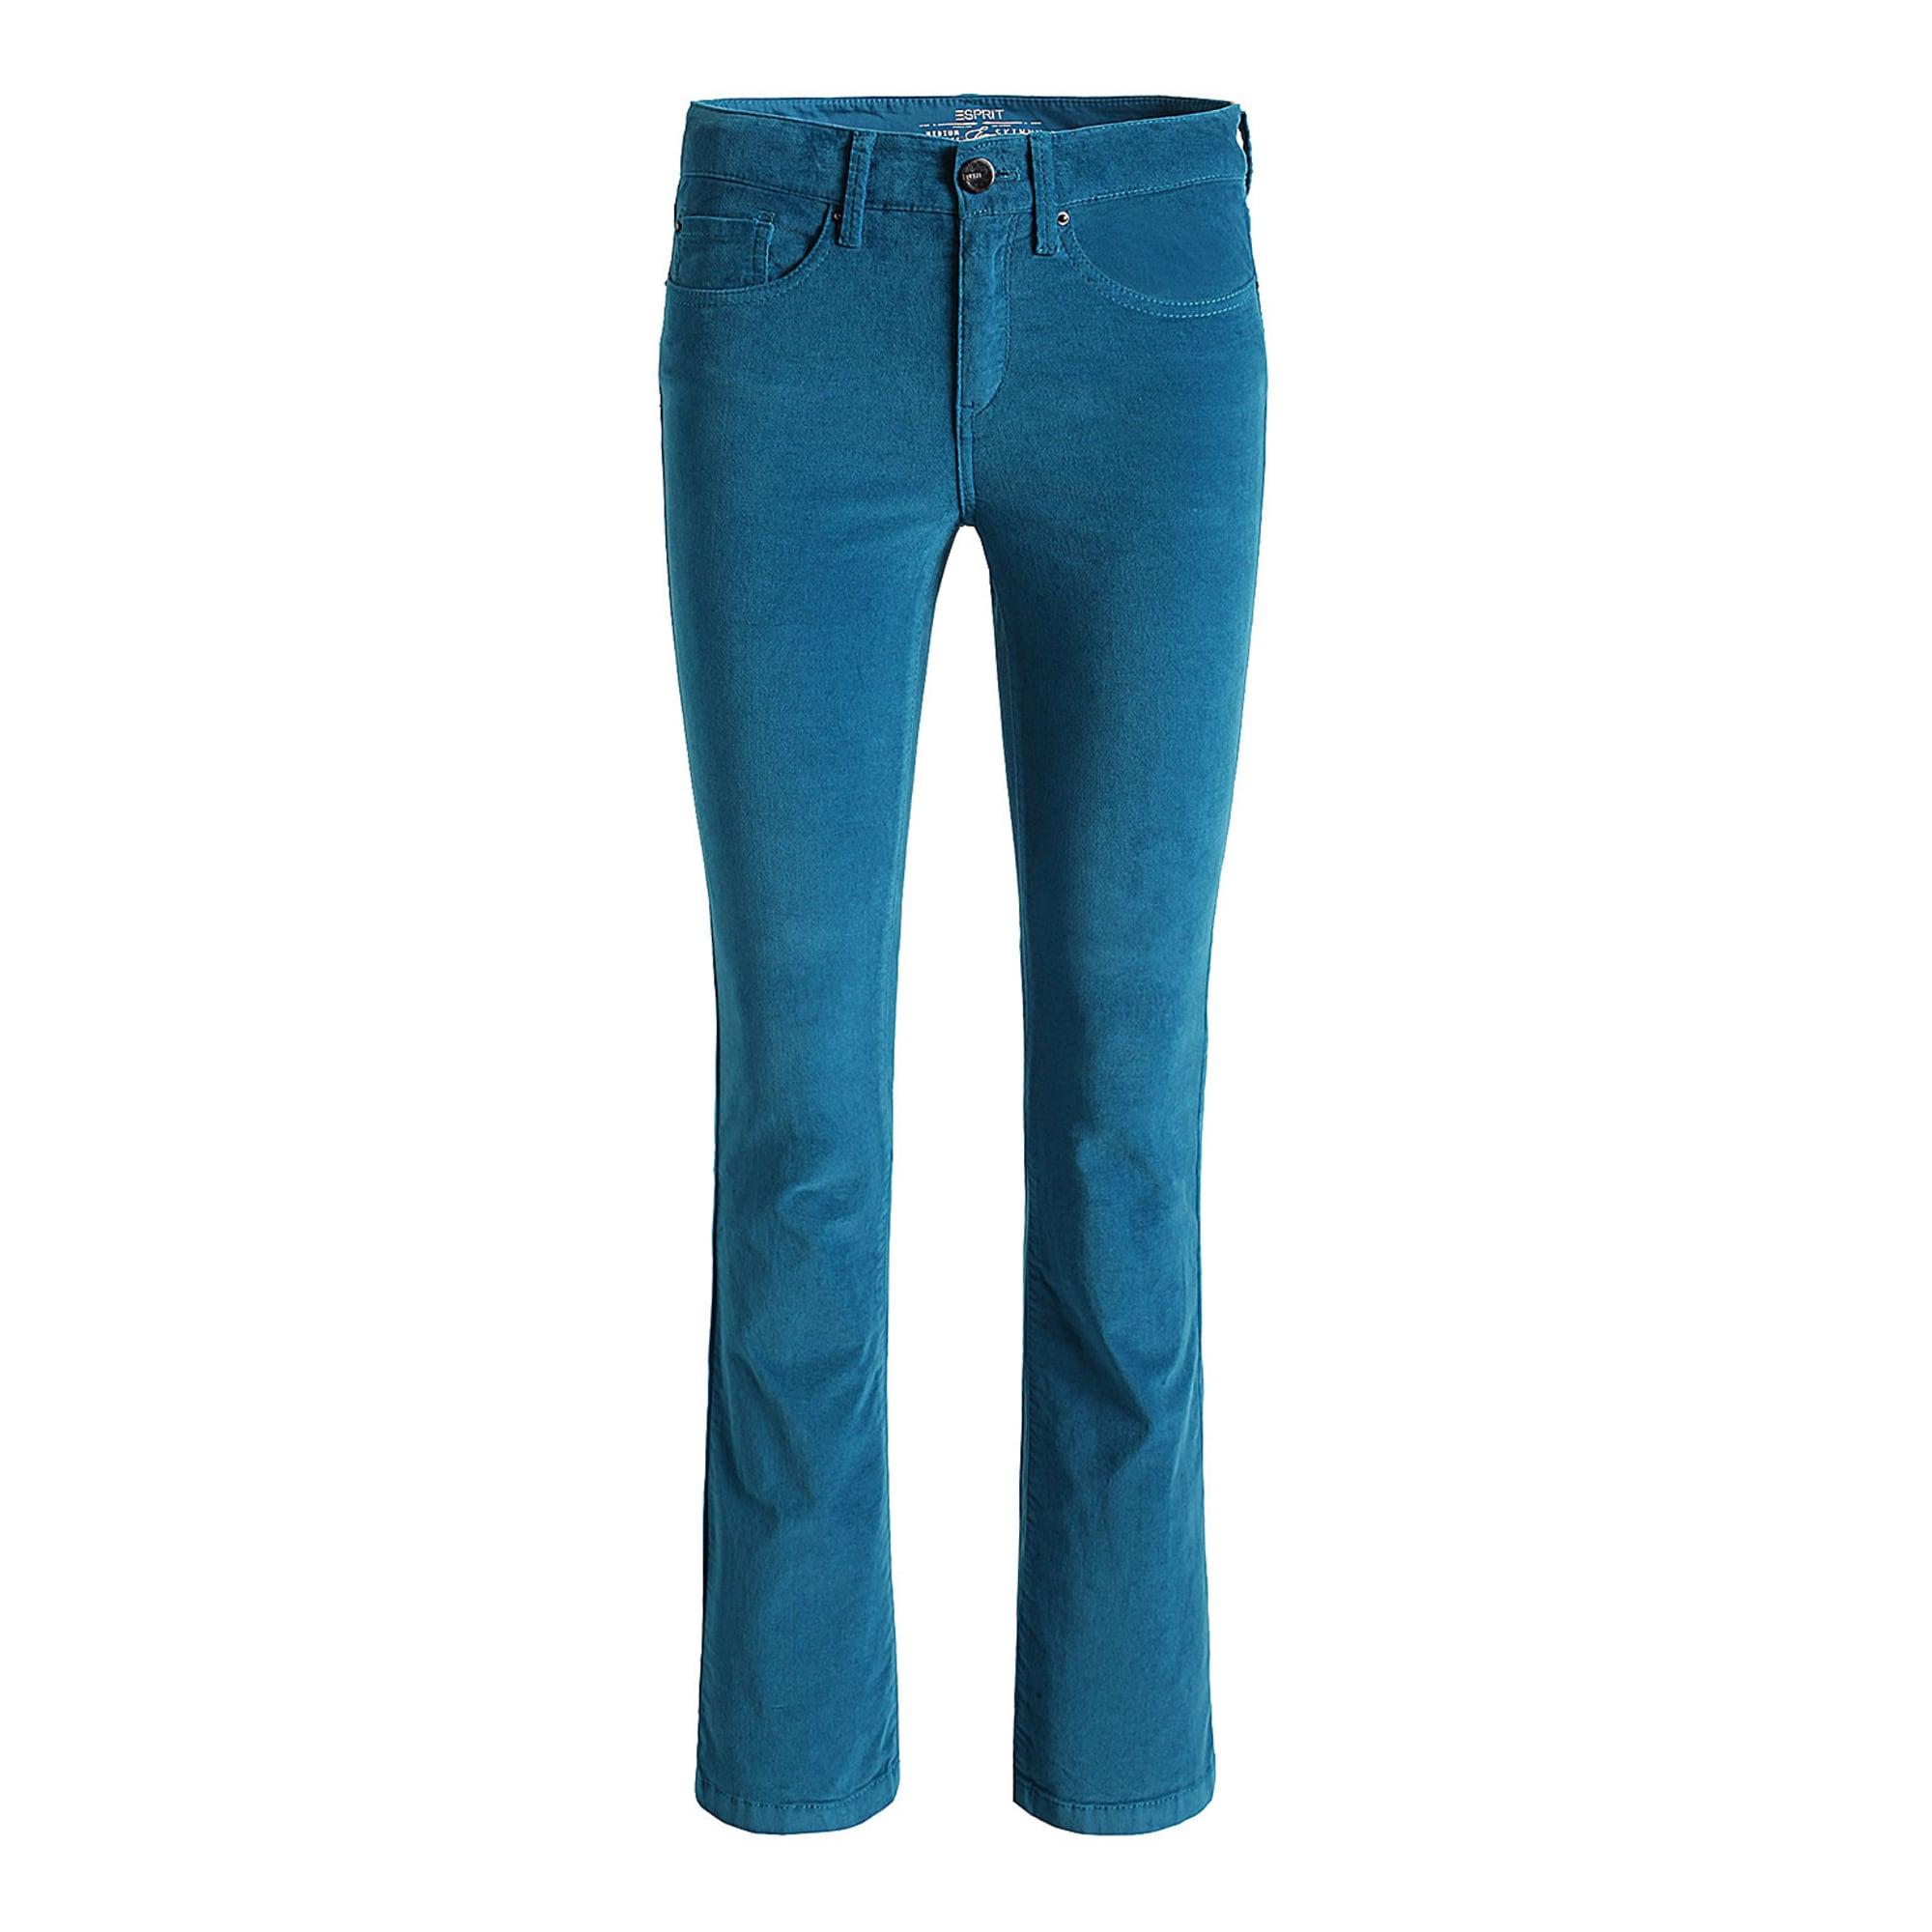 Pantalon évasé ESPRIT Bleu, bleu marine, bleu turquoise